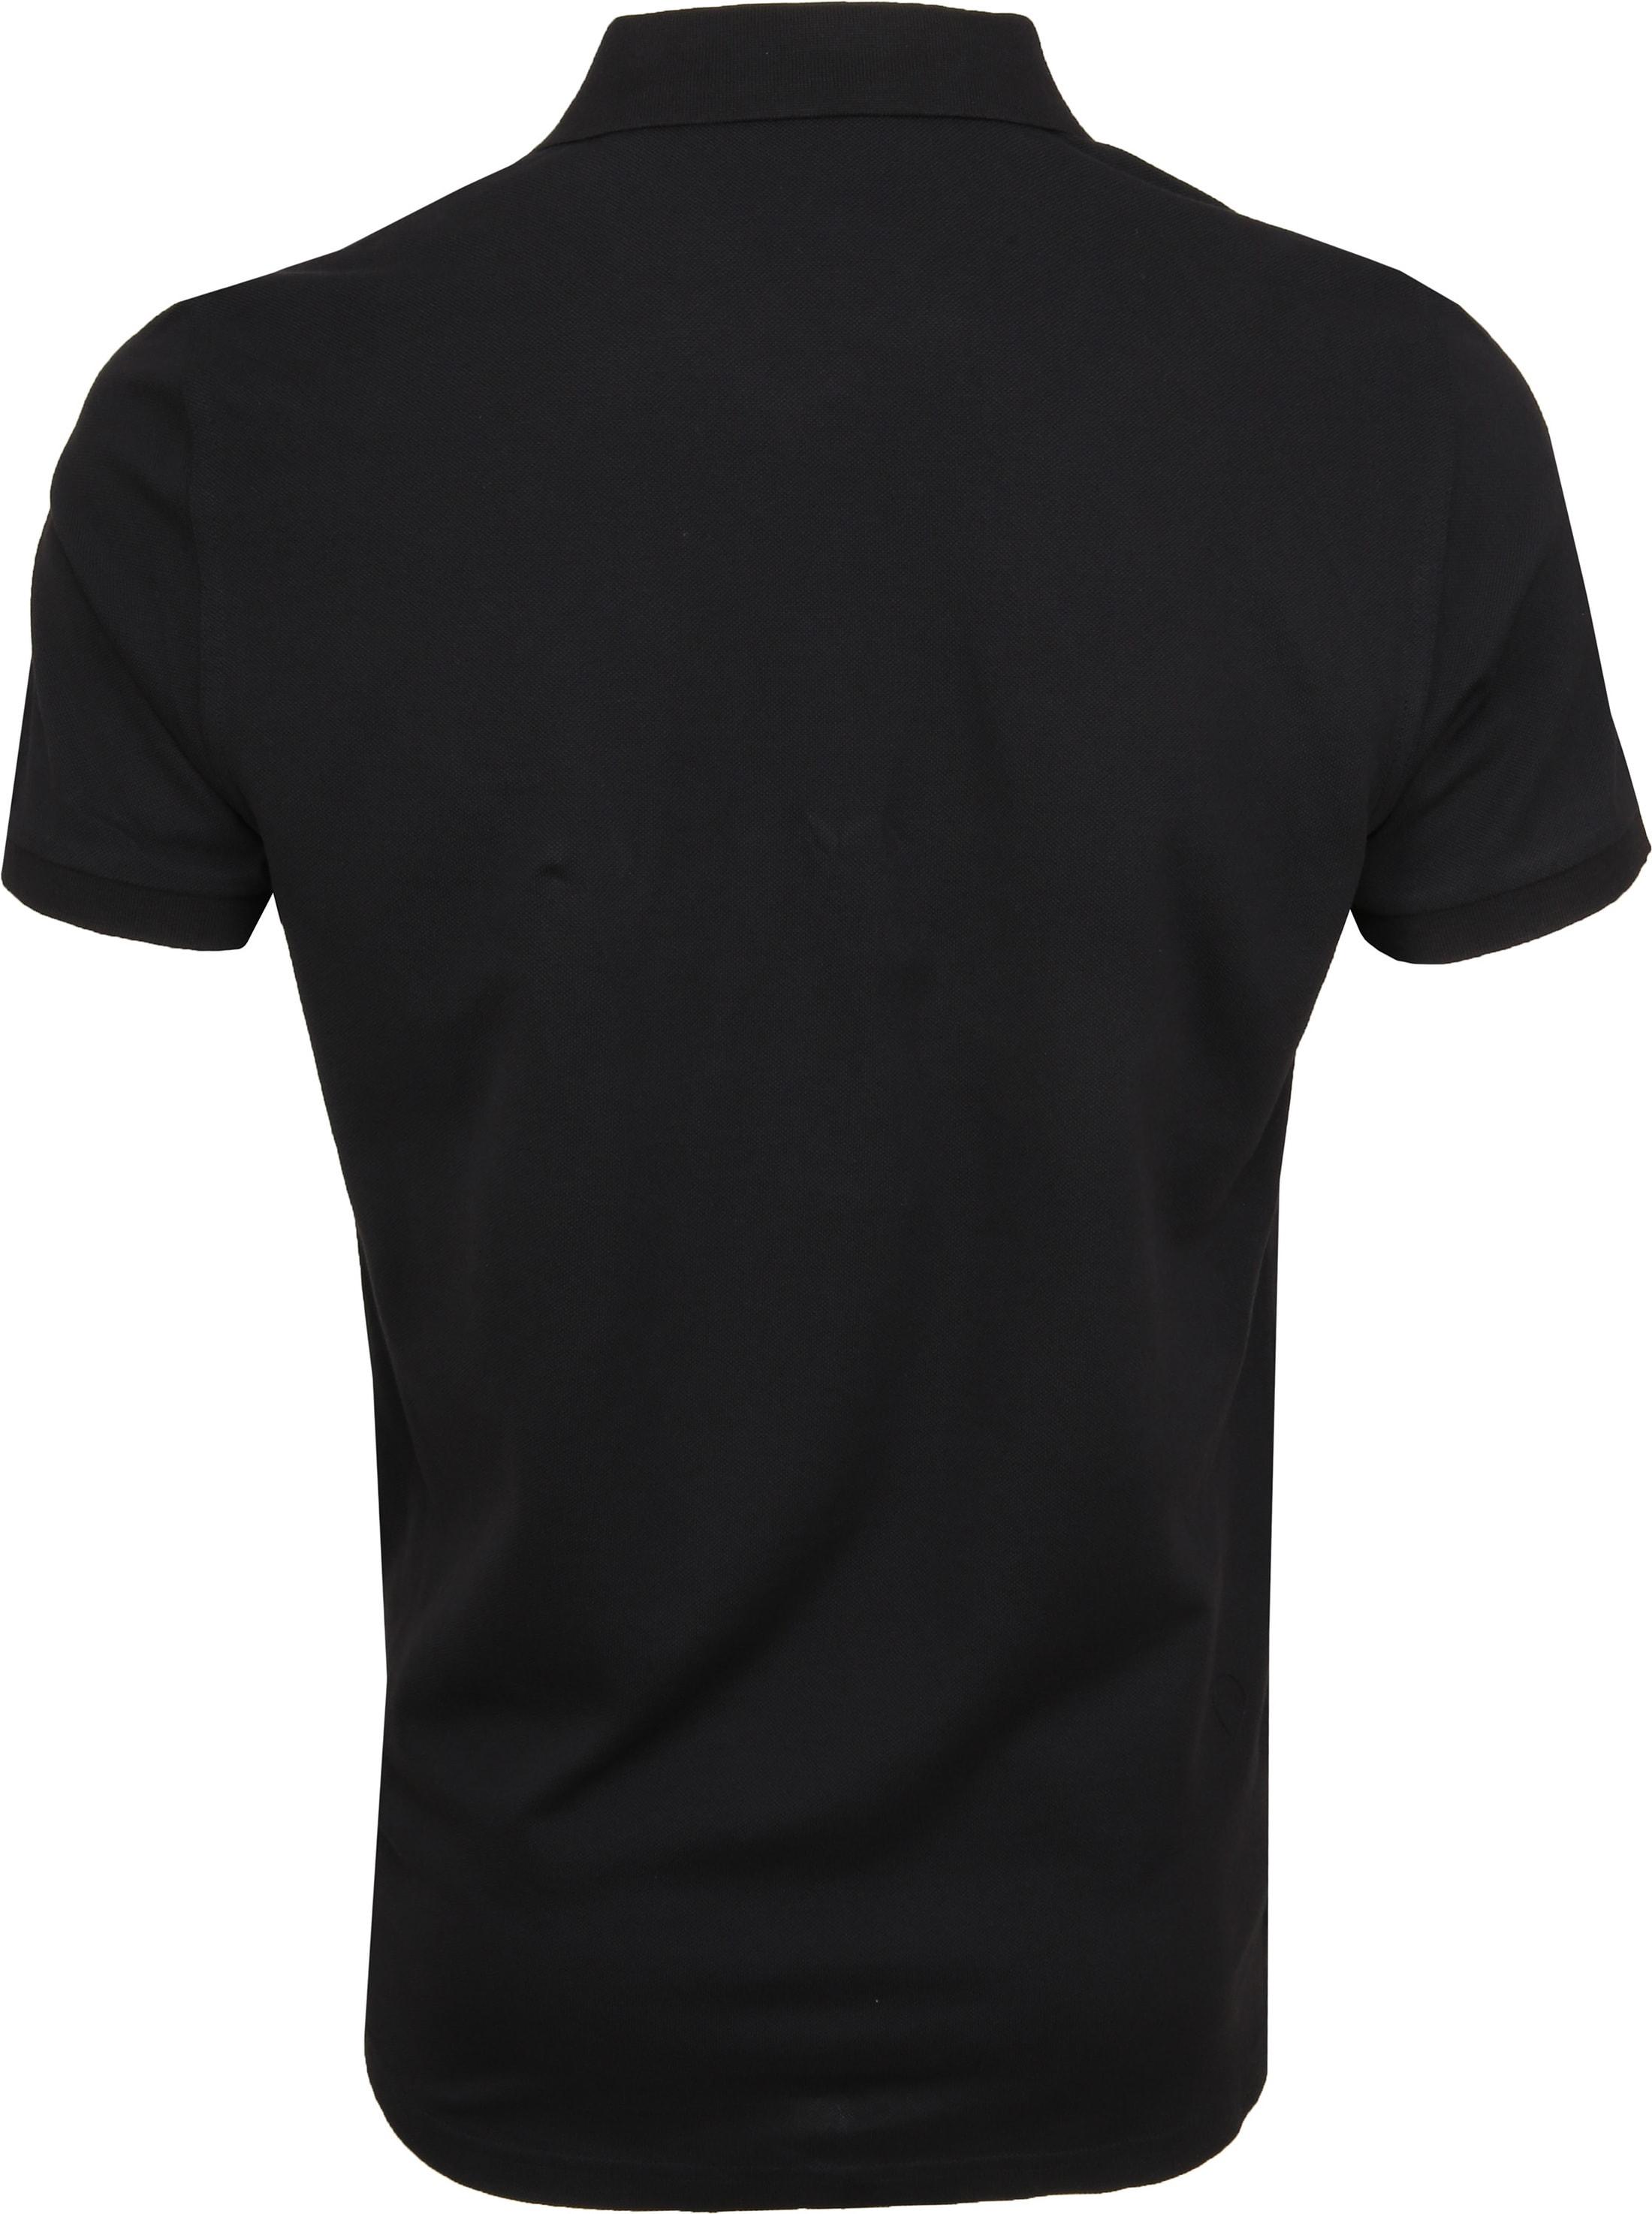 Gant Poloshirt Basic Zwart foto 3